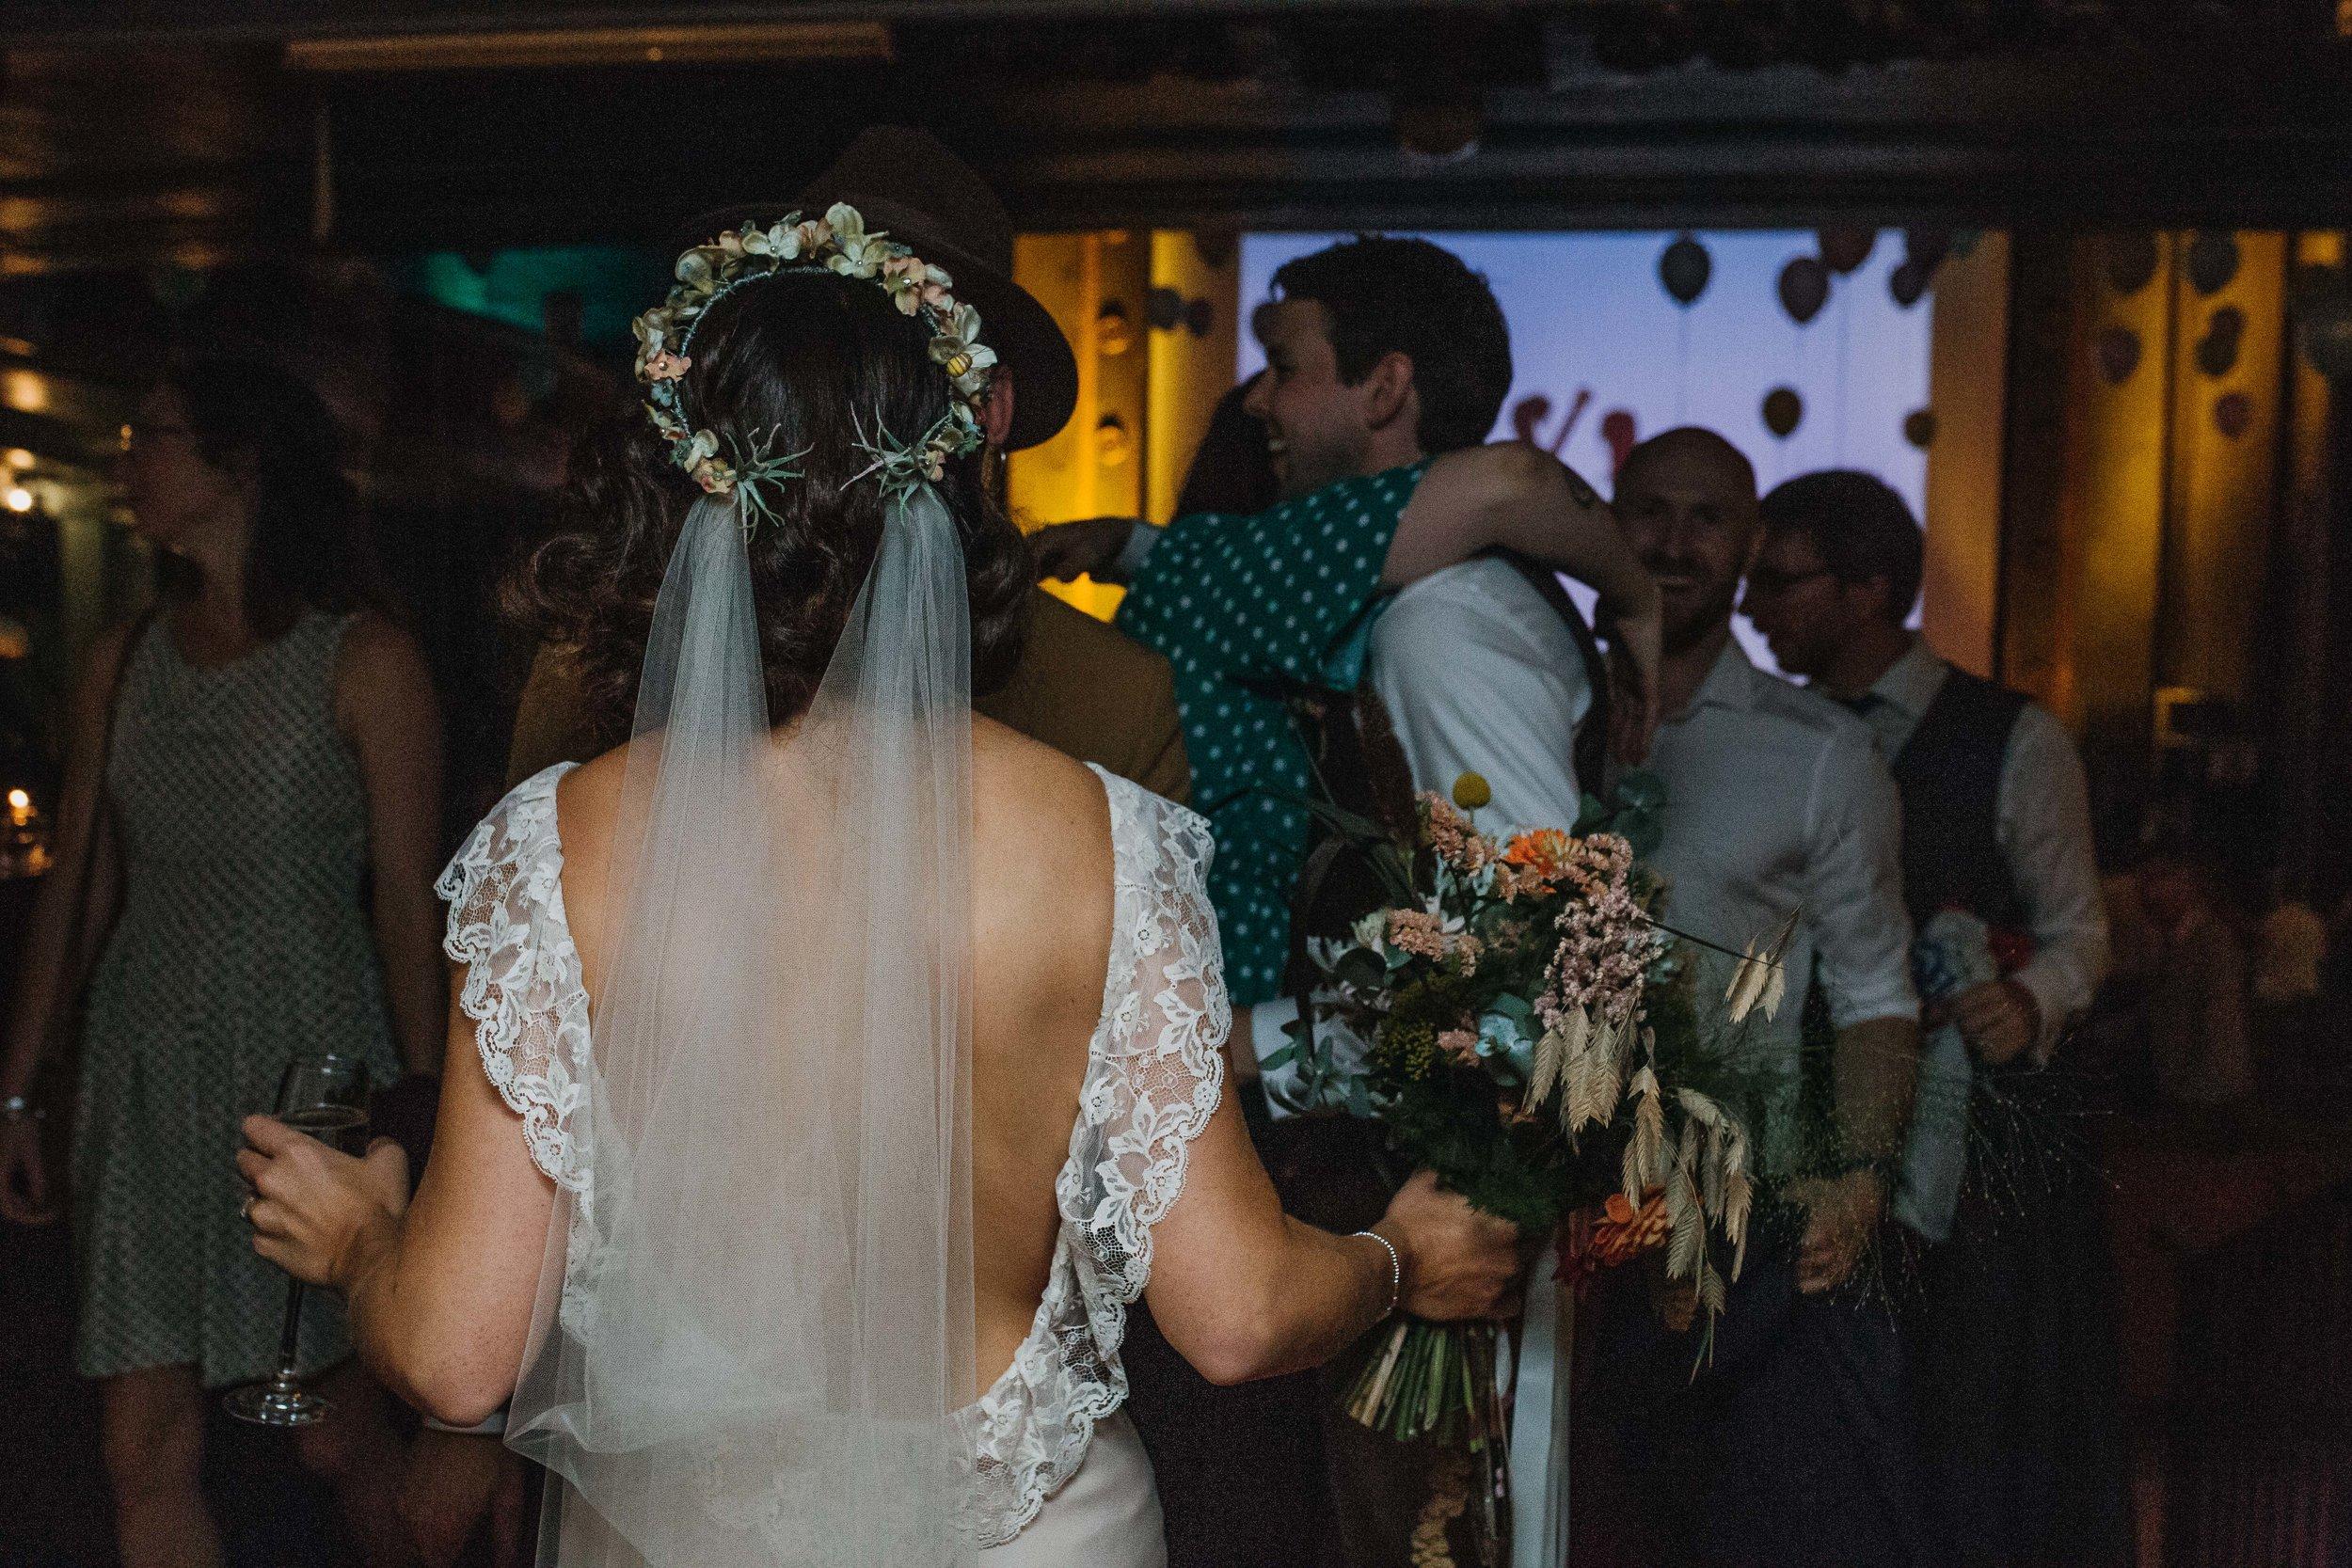 Katy-Bespoke-Veil-Sheffield-Wedding-Wes-Anderson-Susanna-Greening-Derbyshire-16